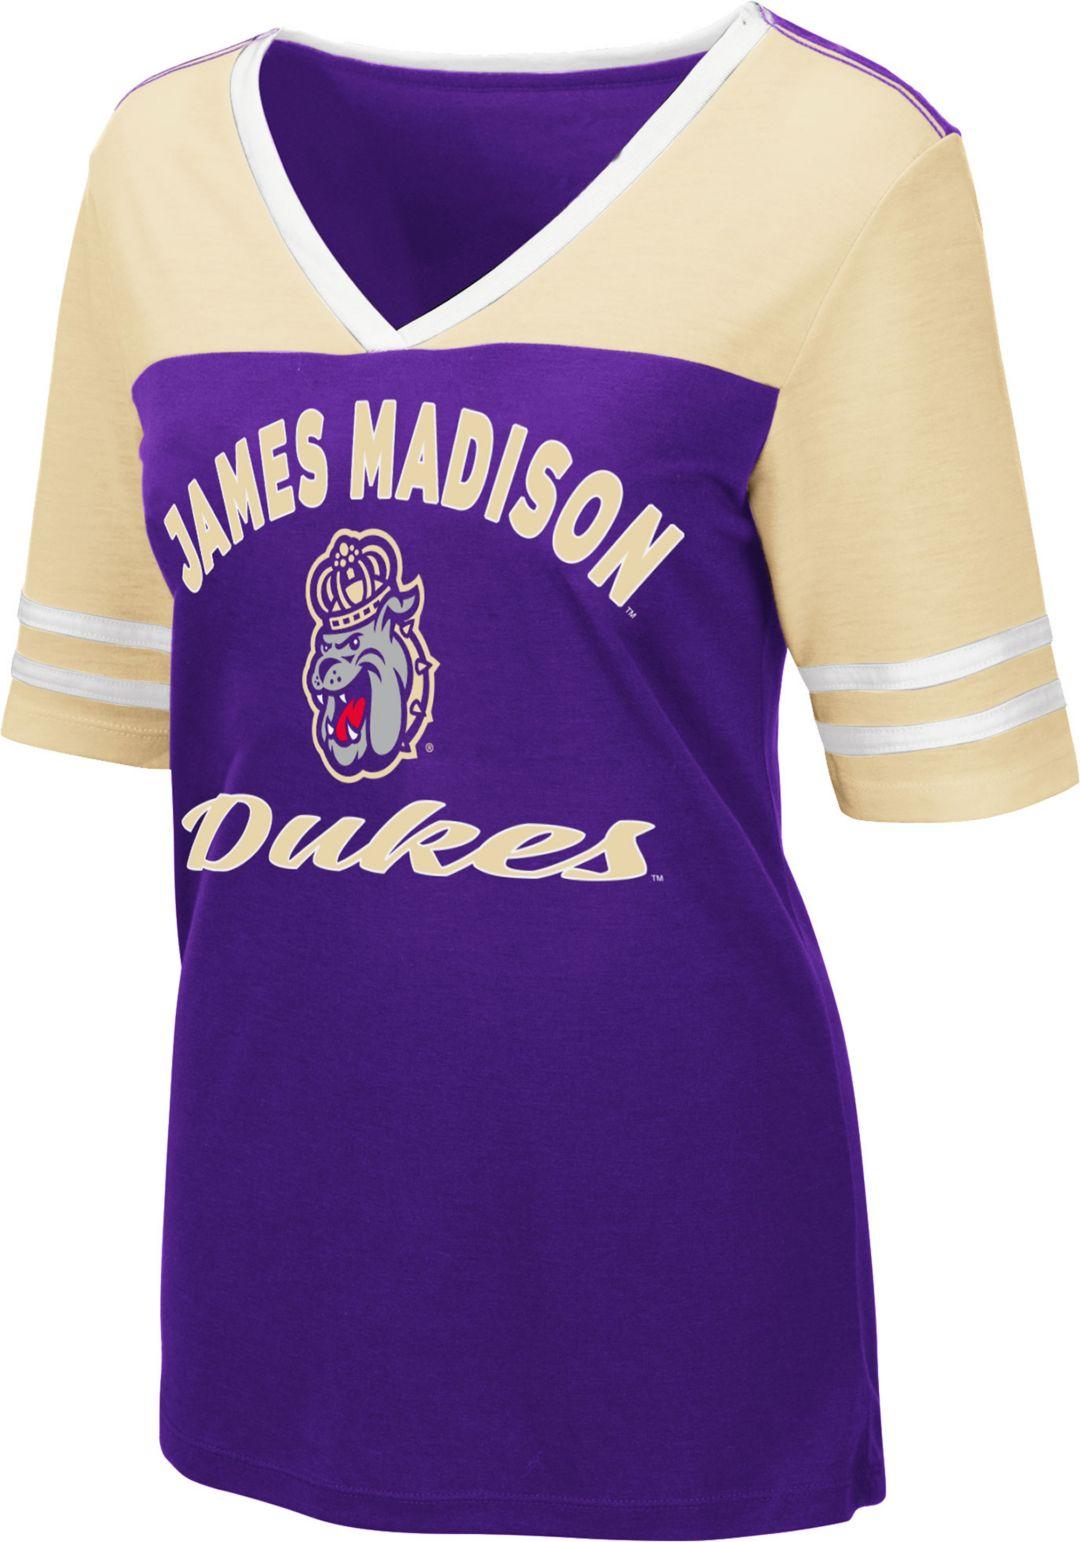 on sale bbb96 966b0 Colosseum Women's James Madison Dukes Purple Samantha T-Shirt